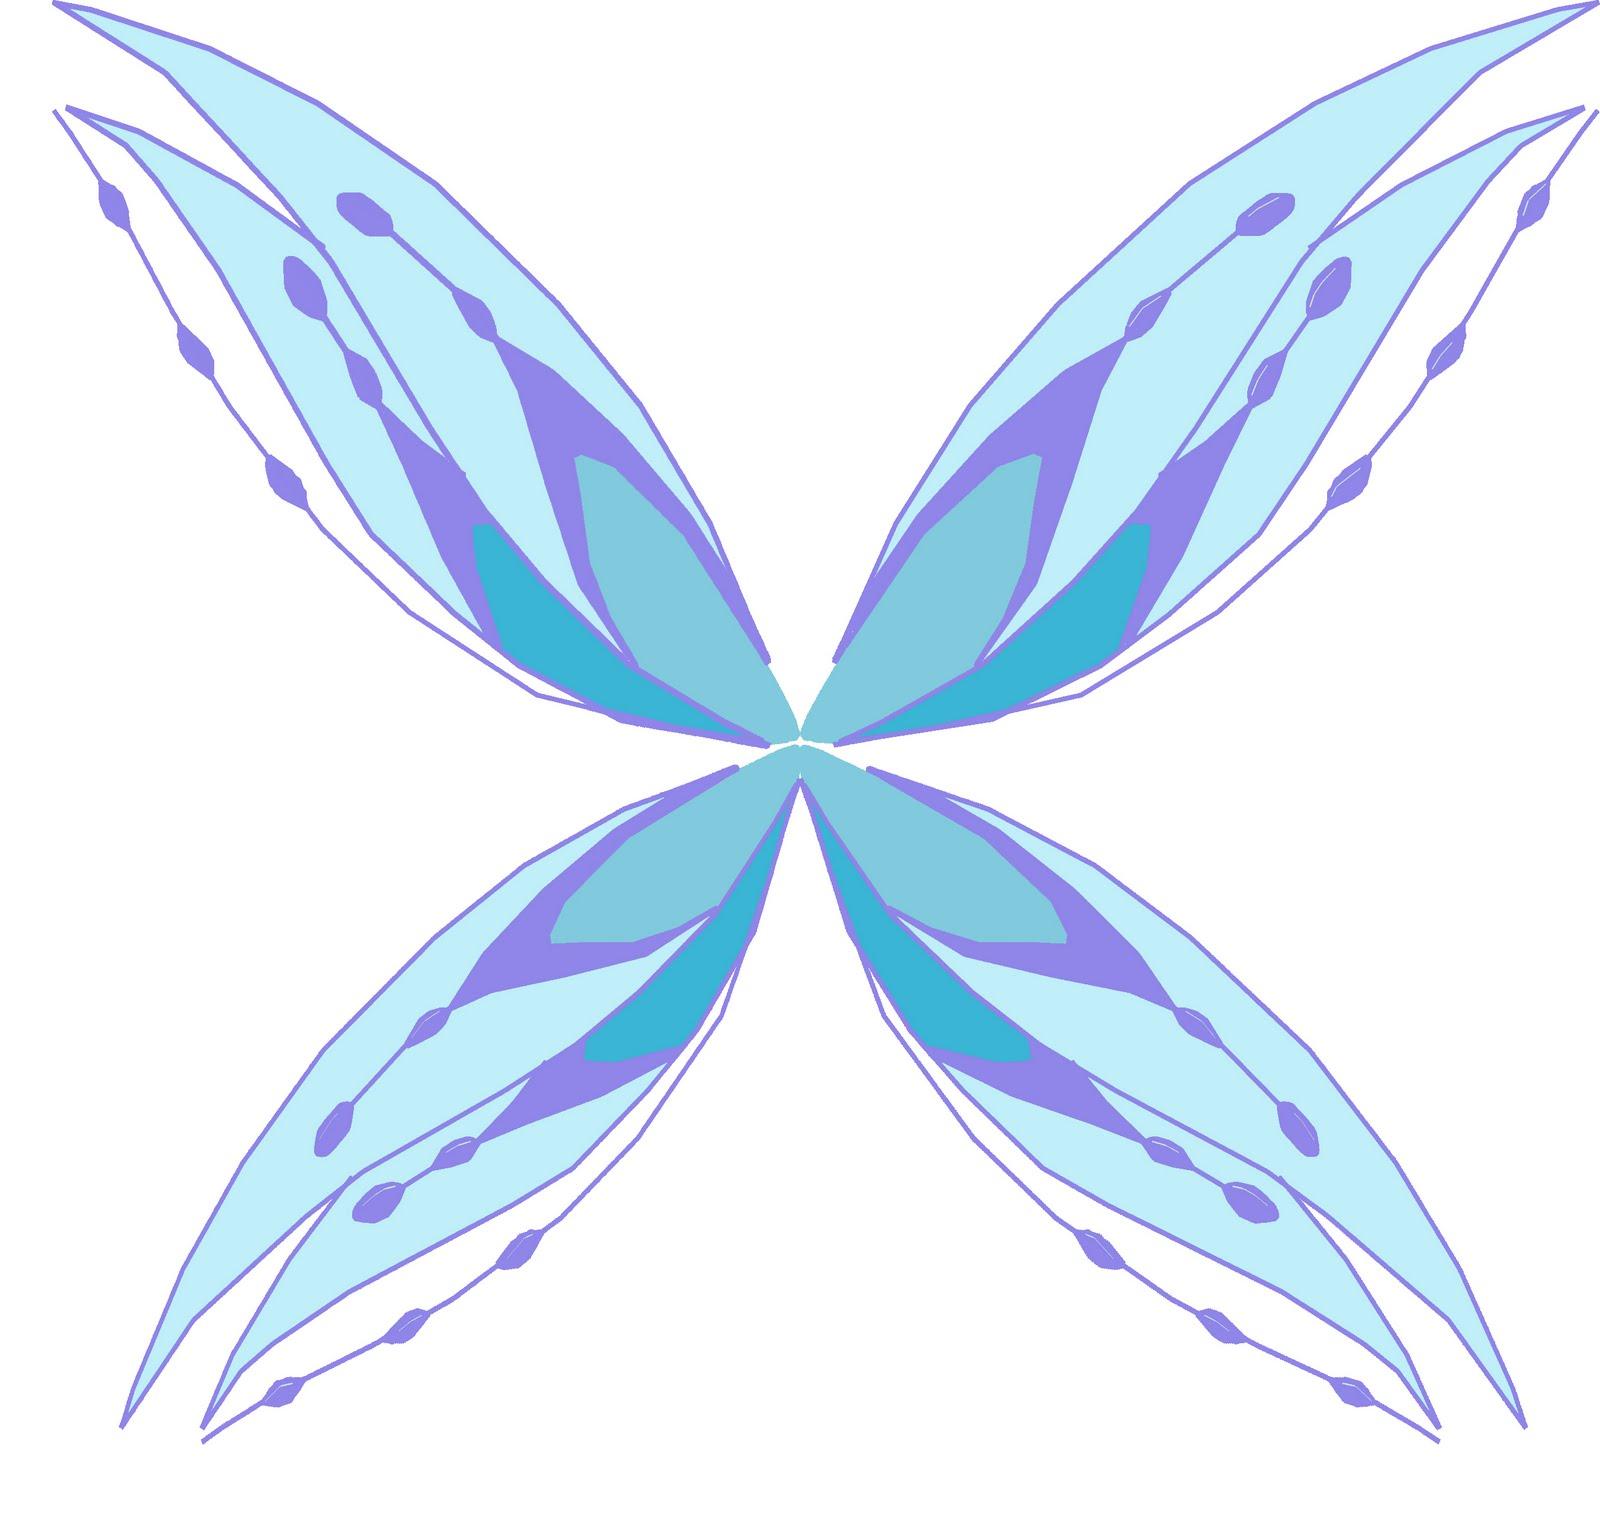 http://3.bp.blogspot.com/_J1eKITQ_ojE/S6yv8hbeY_I/AAAAAAAABF8/3Tx7MT4TgVU/s1600/zoomix_layla.jpg